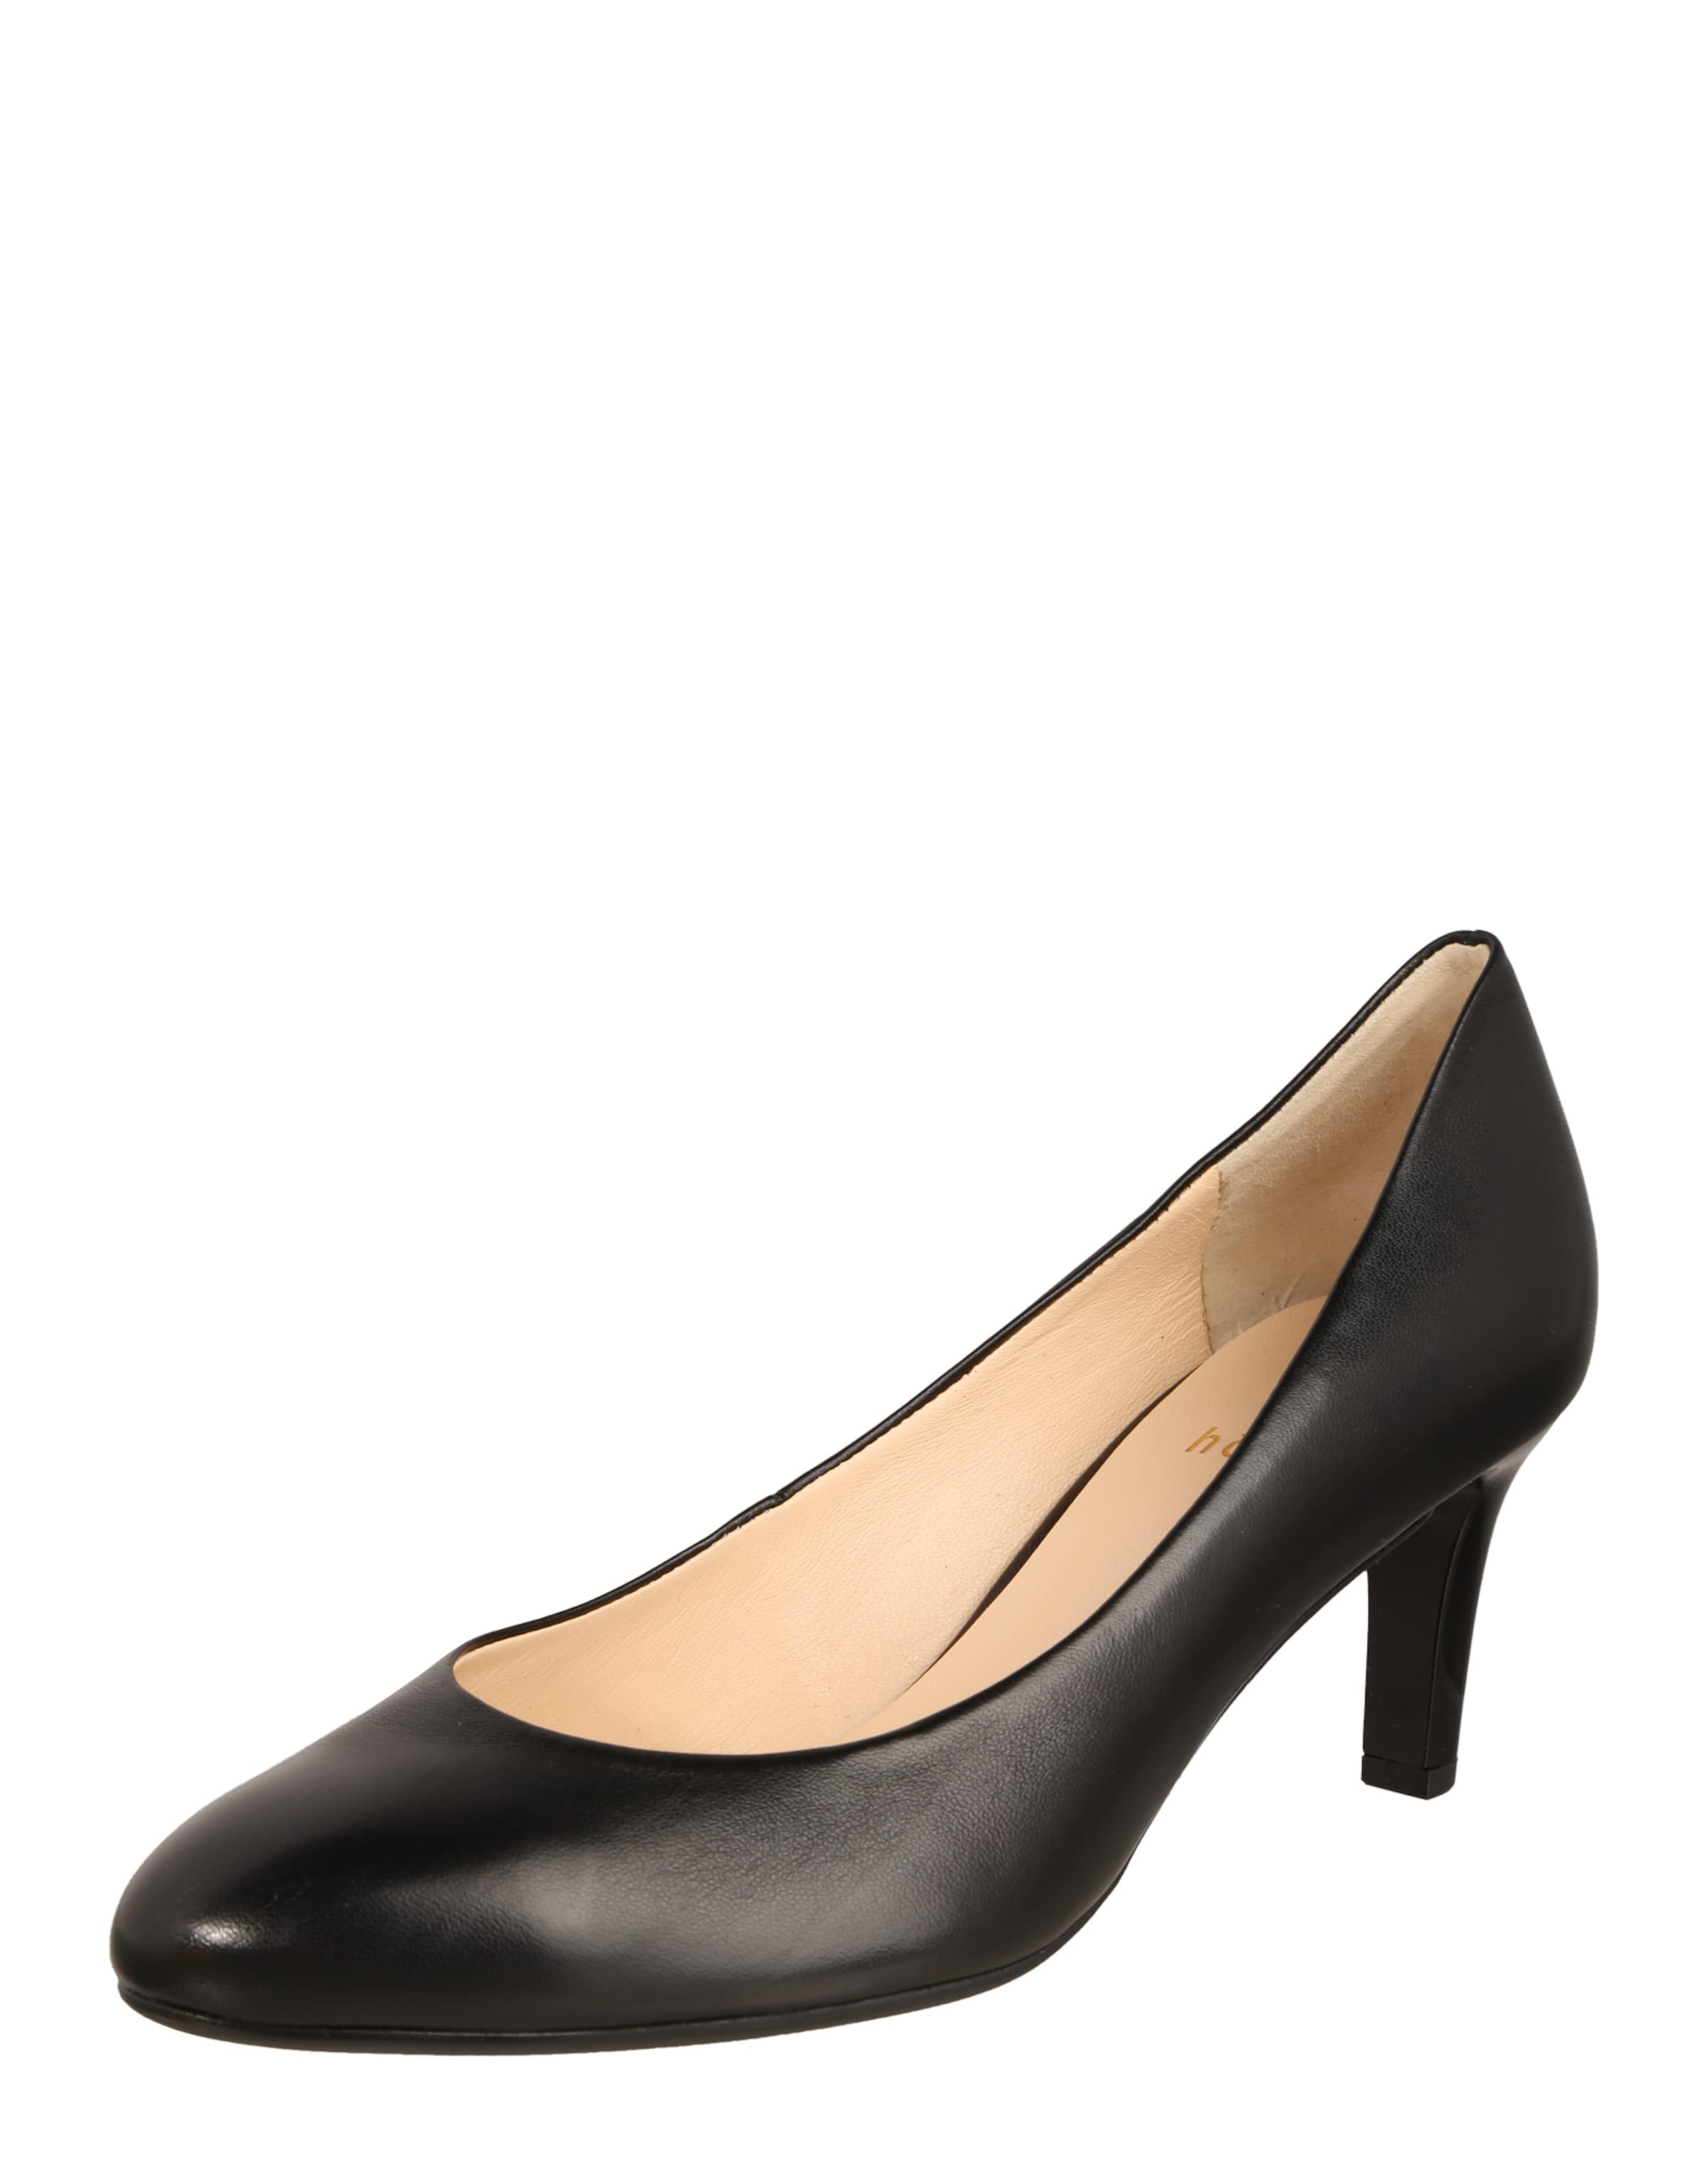 Haltbare Mode billige Schuhe Högl | Schlichte Pumps Schuhe Gut getragene Schuhe